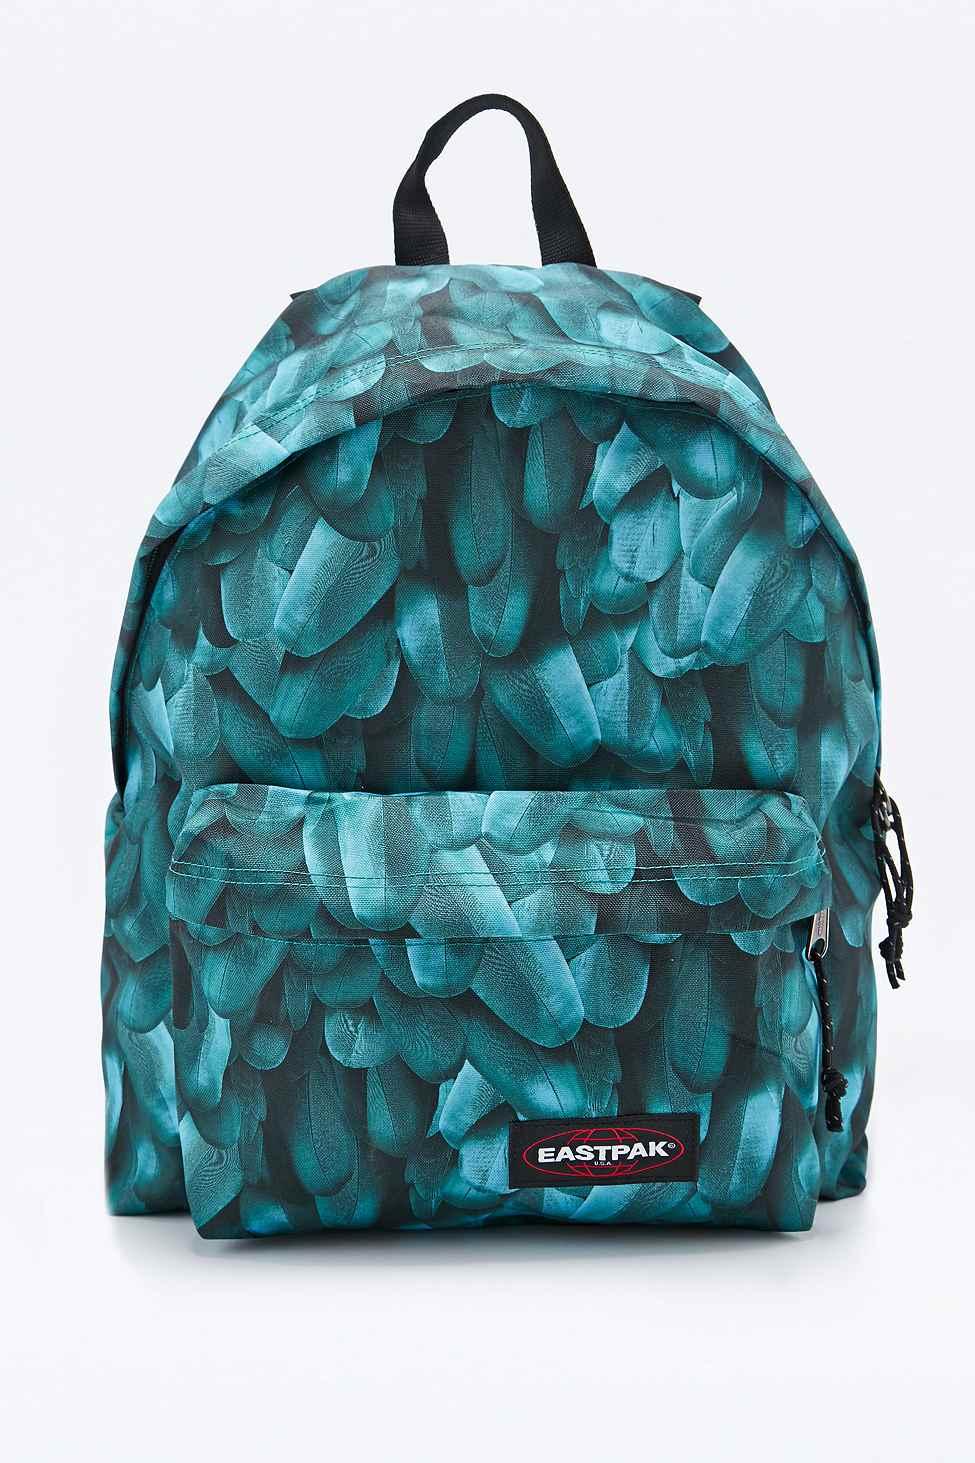 eastpak pak 39 r feather print padded backpack in teal in blue lyst. Black Bedroom Furniture Sets. Home Design Ideas